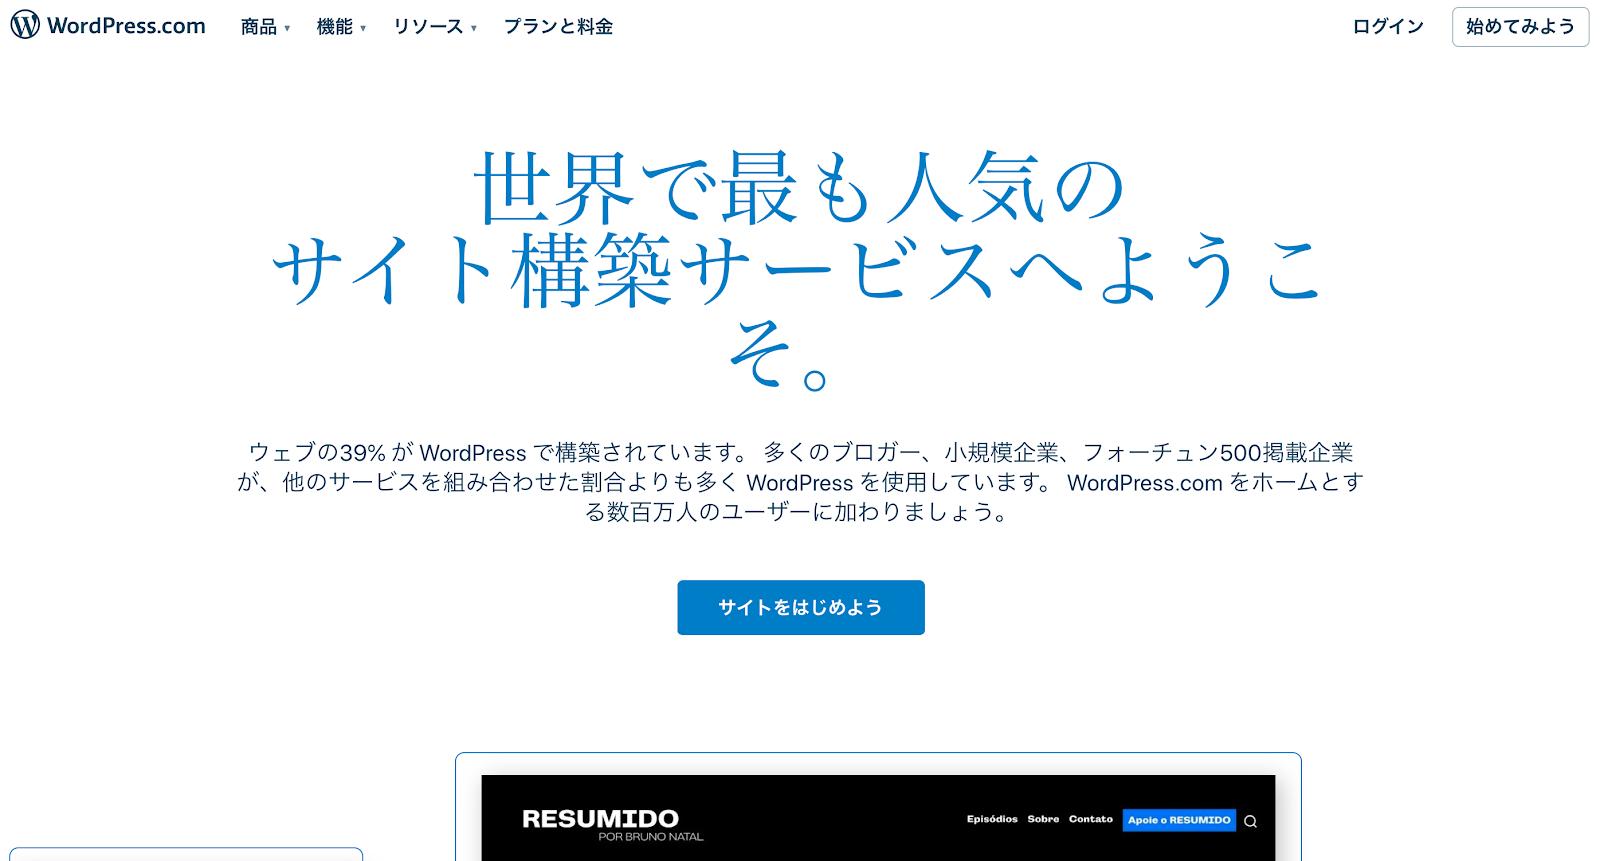 WordPressのスクリーンショット